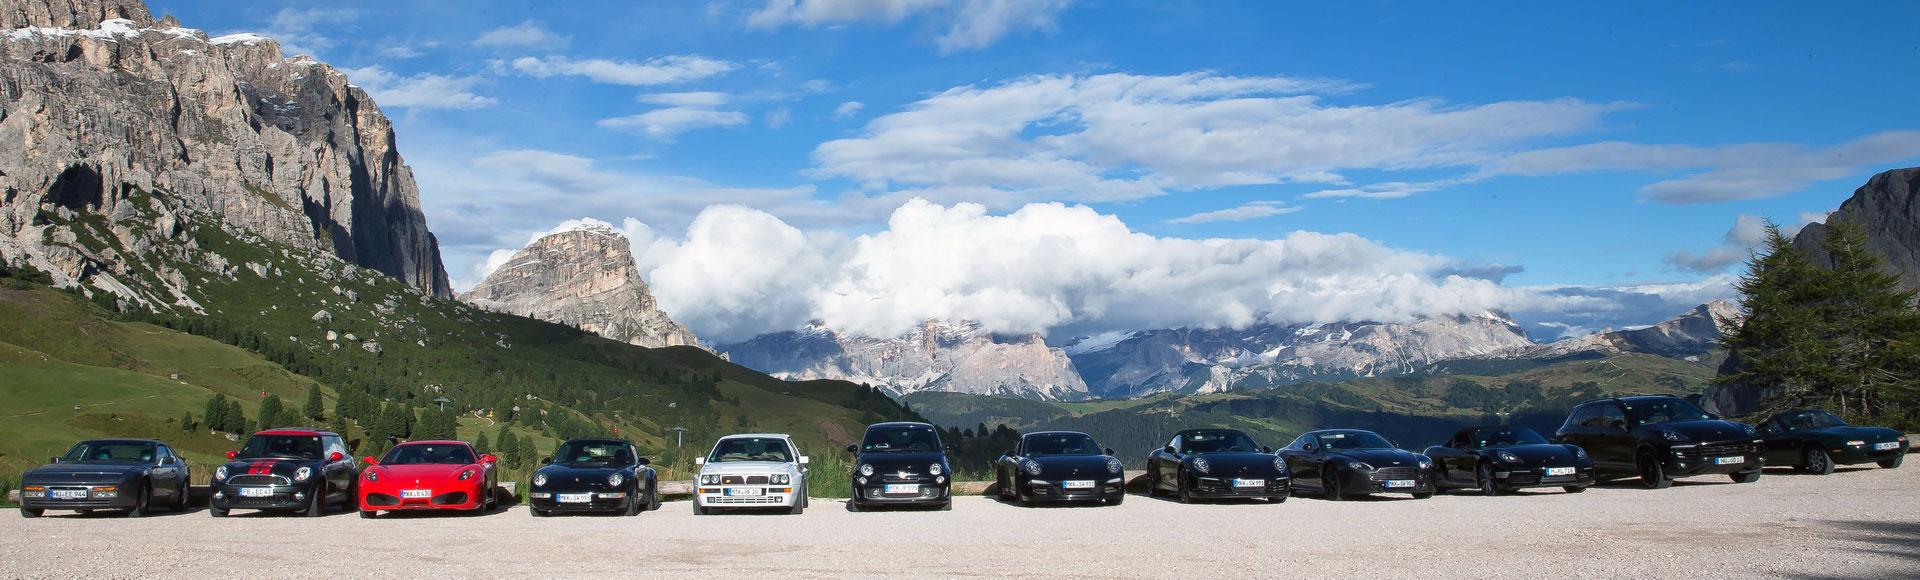 Perlenausfahrt 2016 alle autos 0275